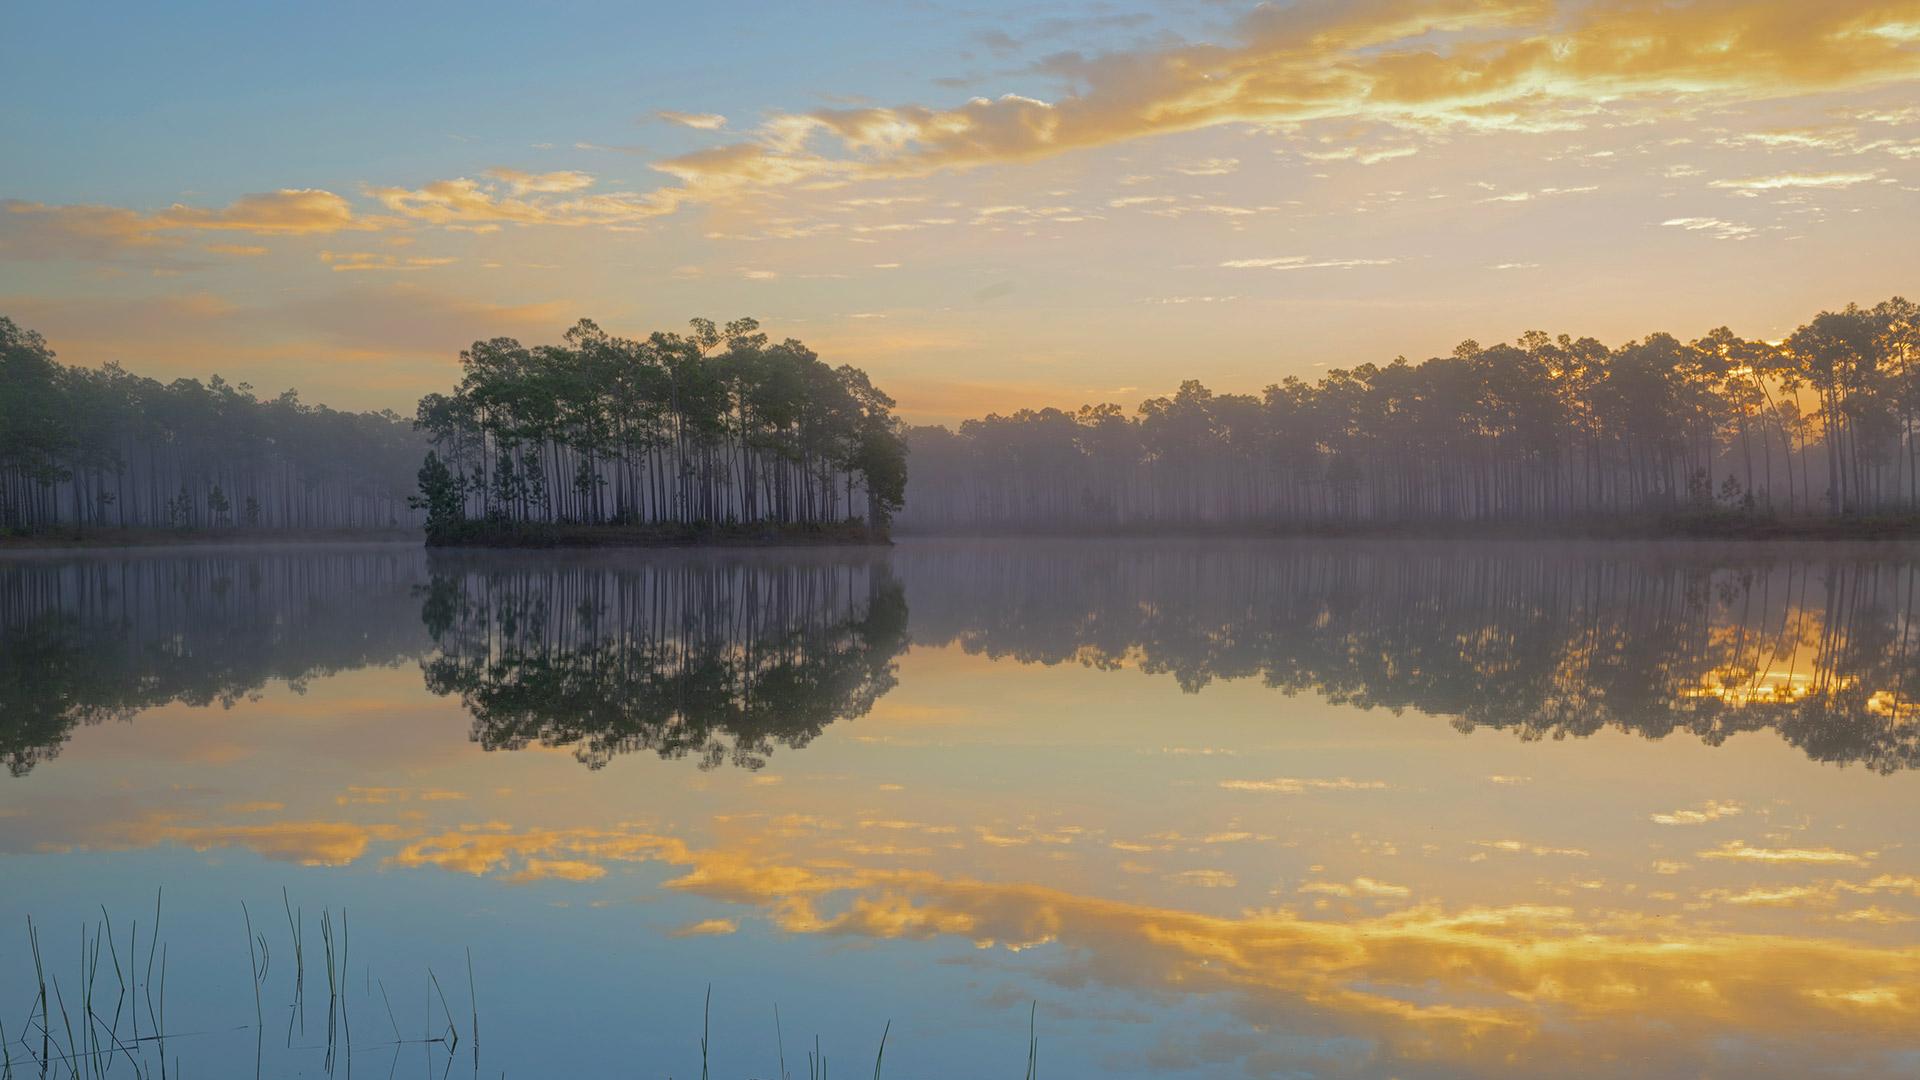 Long Pine Key in Everglades National Park, Florida (© Tandem Stills + Motion)